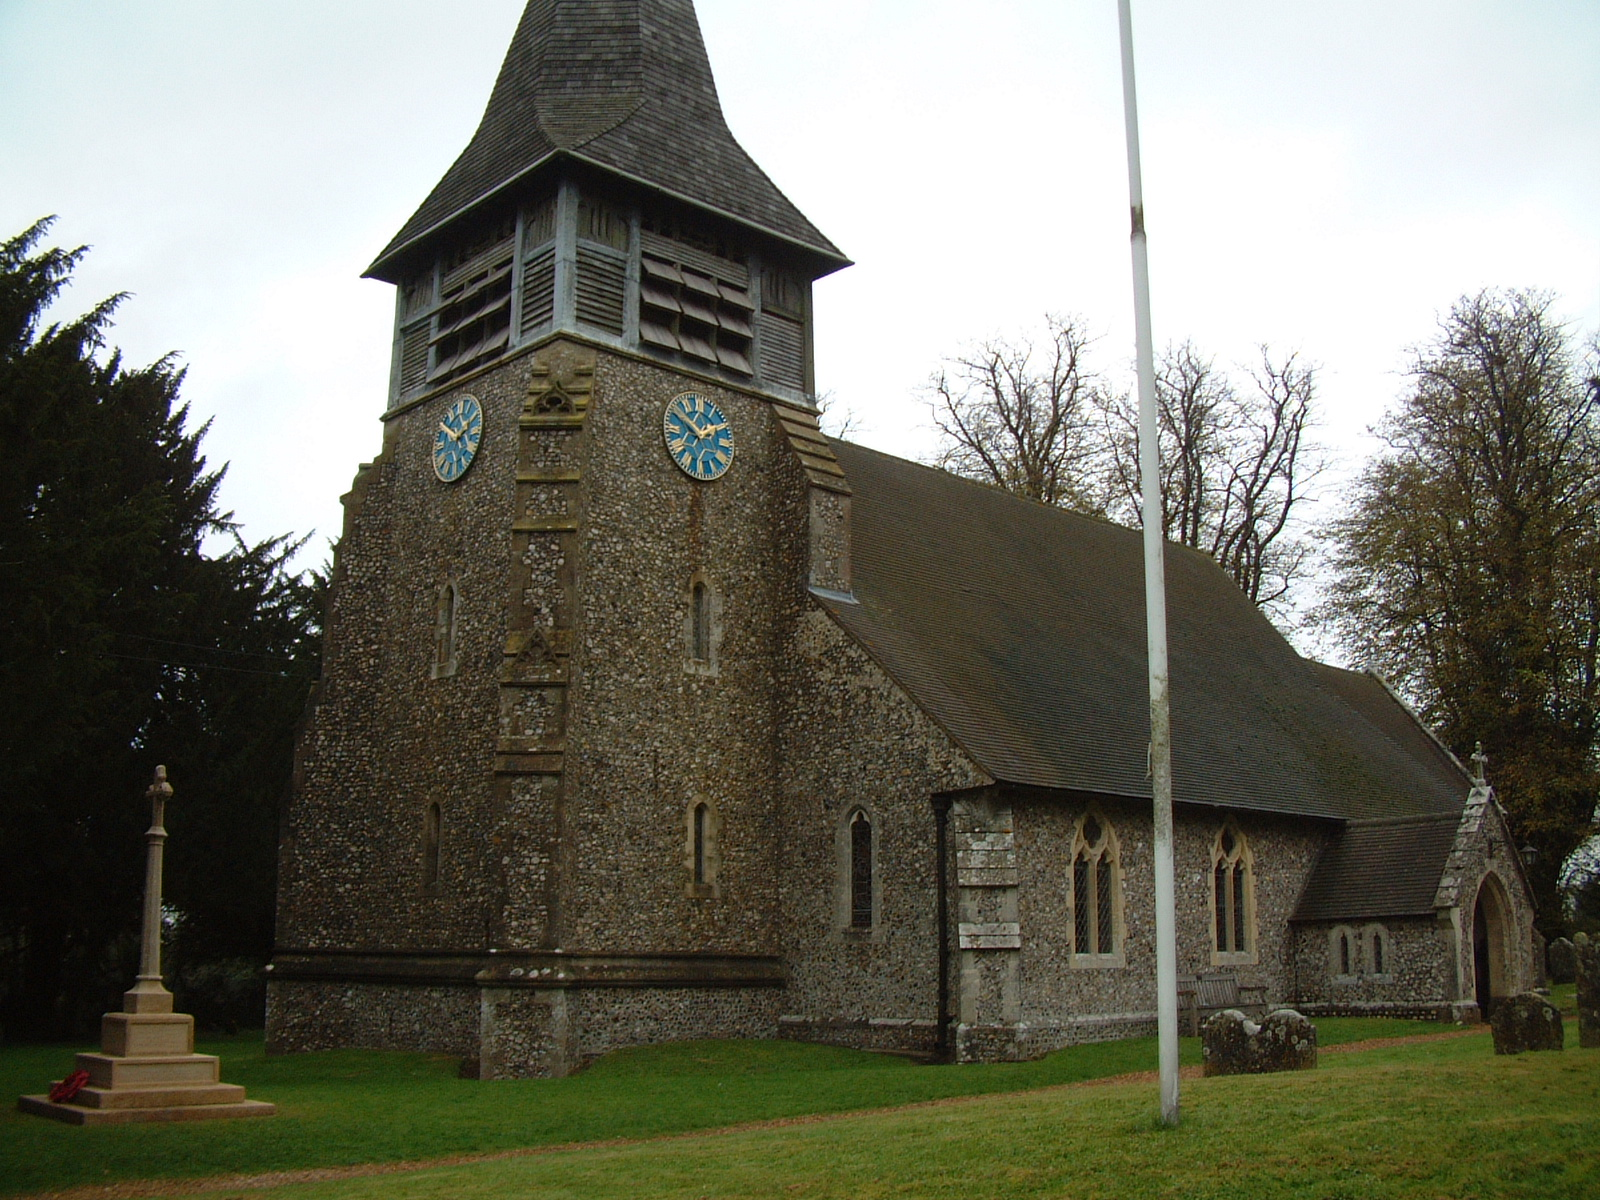 Church clocks